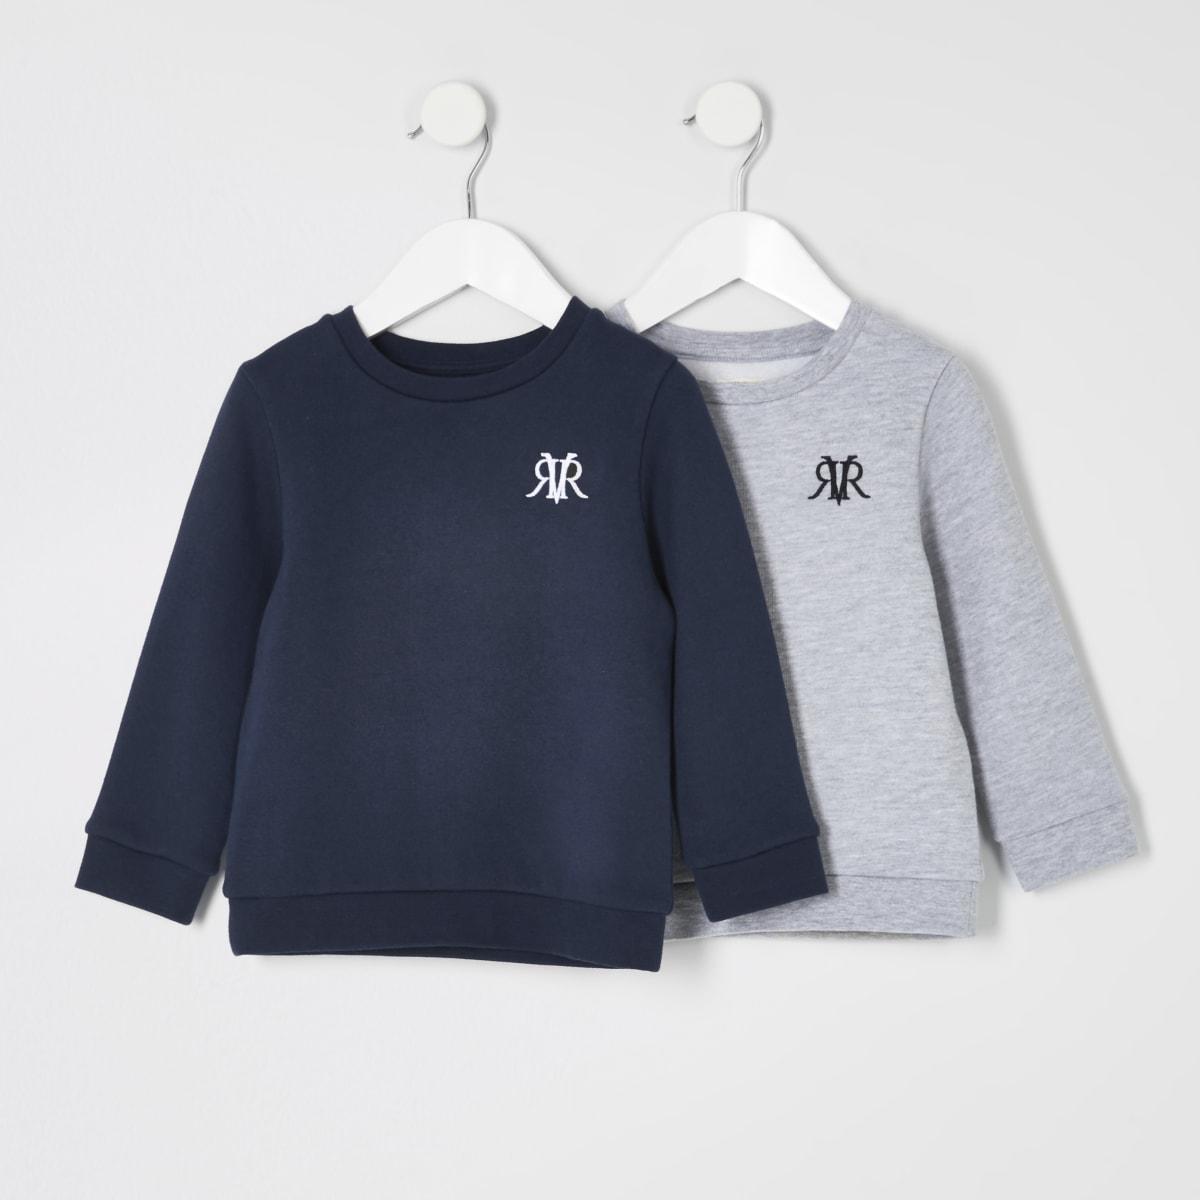 Mini boys navy RVR sweatshirt 2 pack